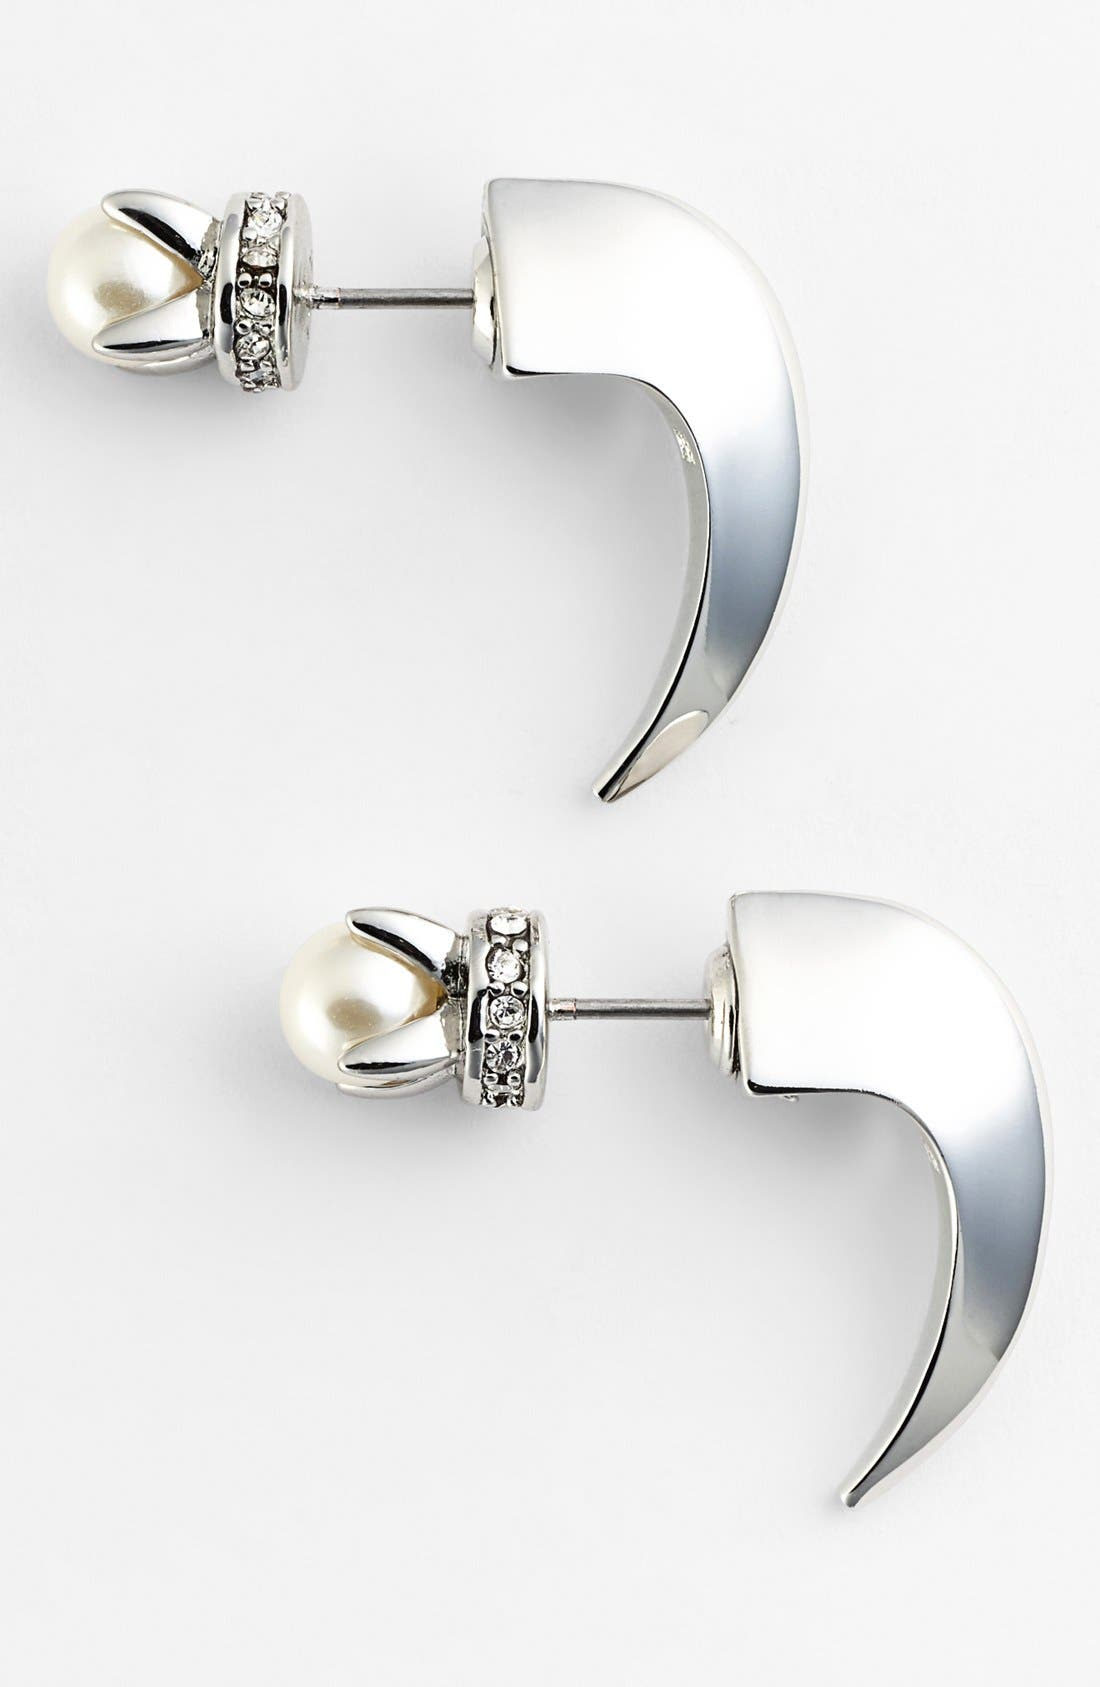 'Curbs' Reversible Hoop Earrings,                             Main thumbnail 1, color,                             Silver/ White Pearl/ Clear